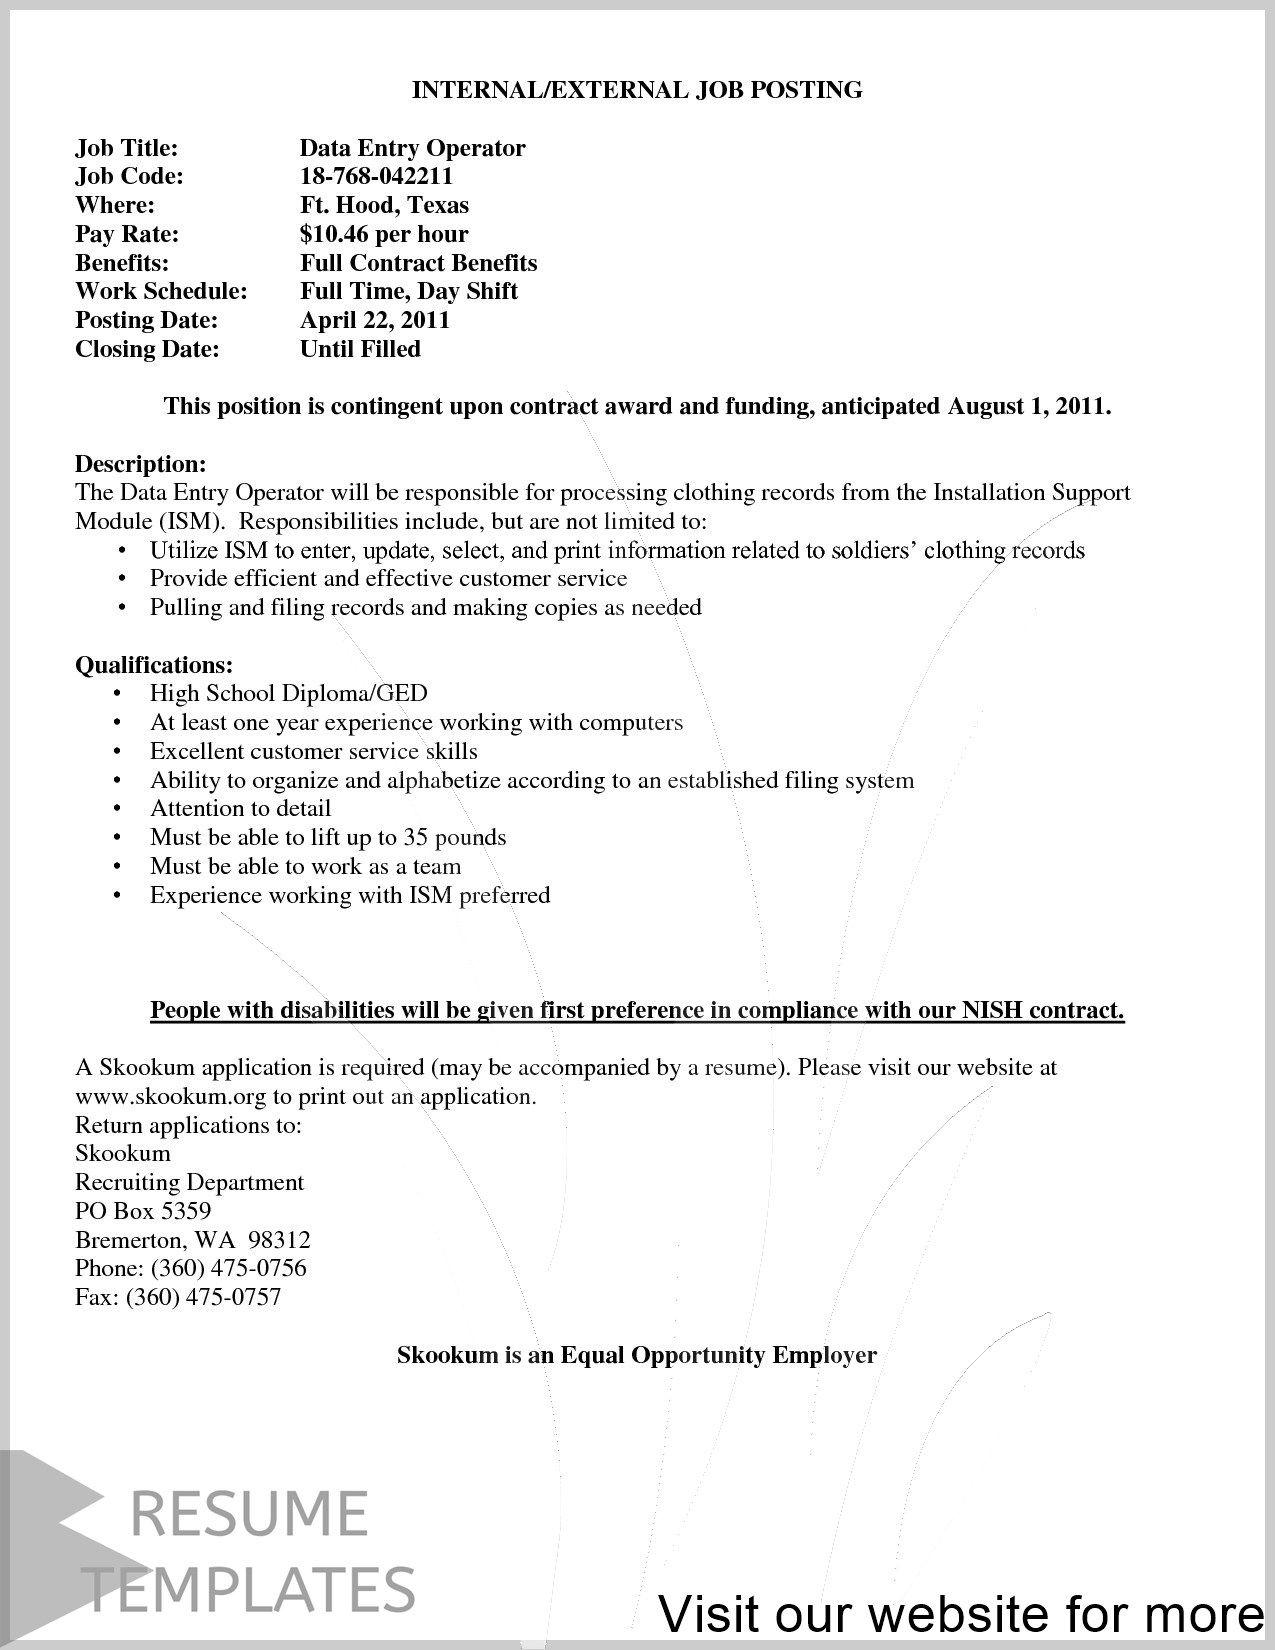 resume template free malaysia in 2020 Resume template